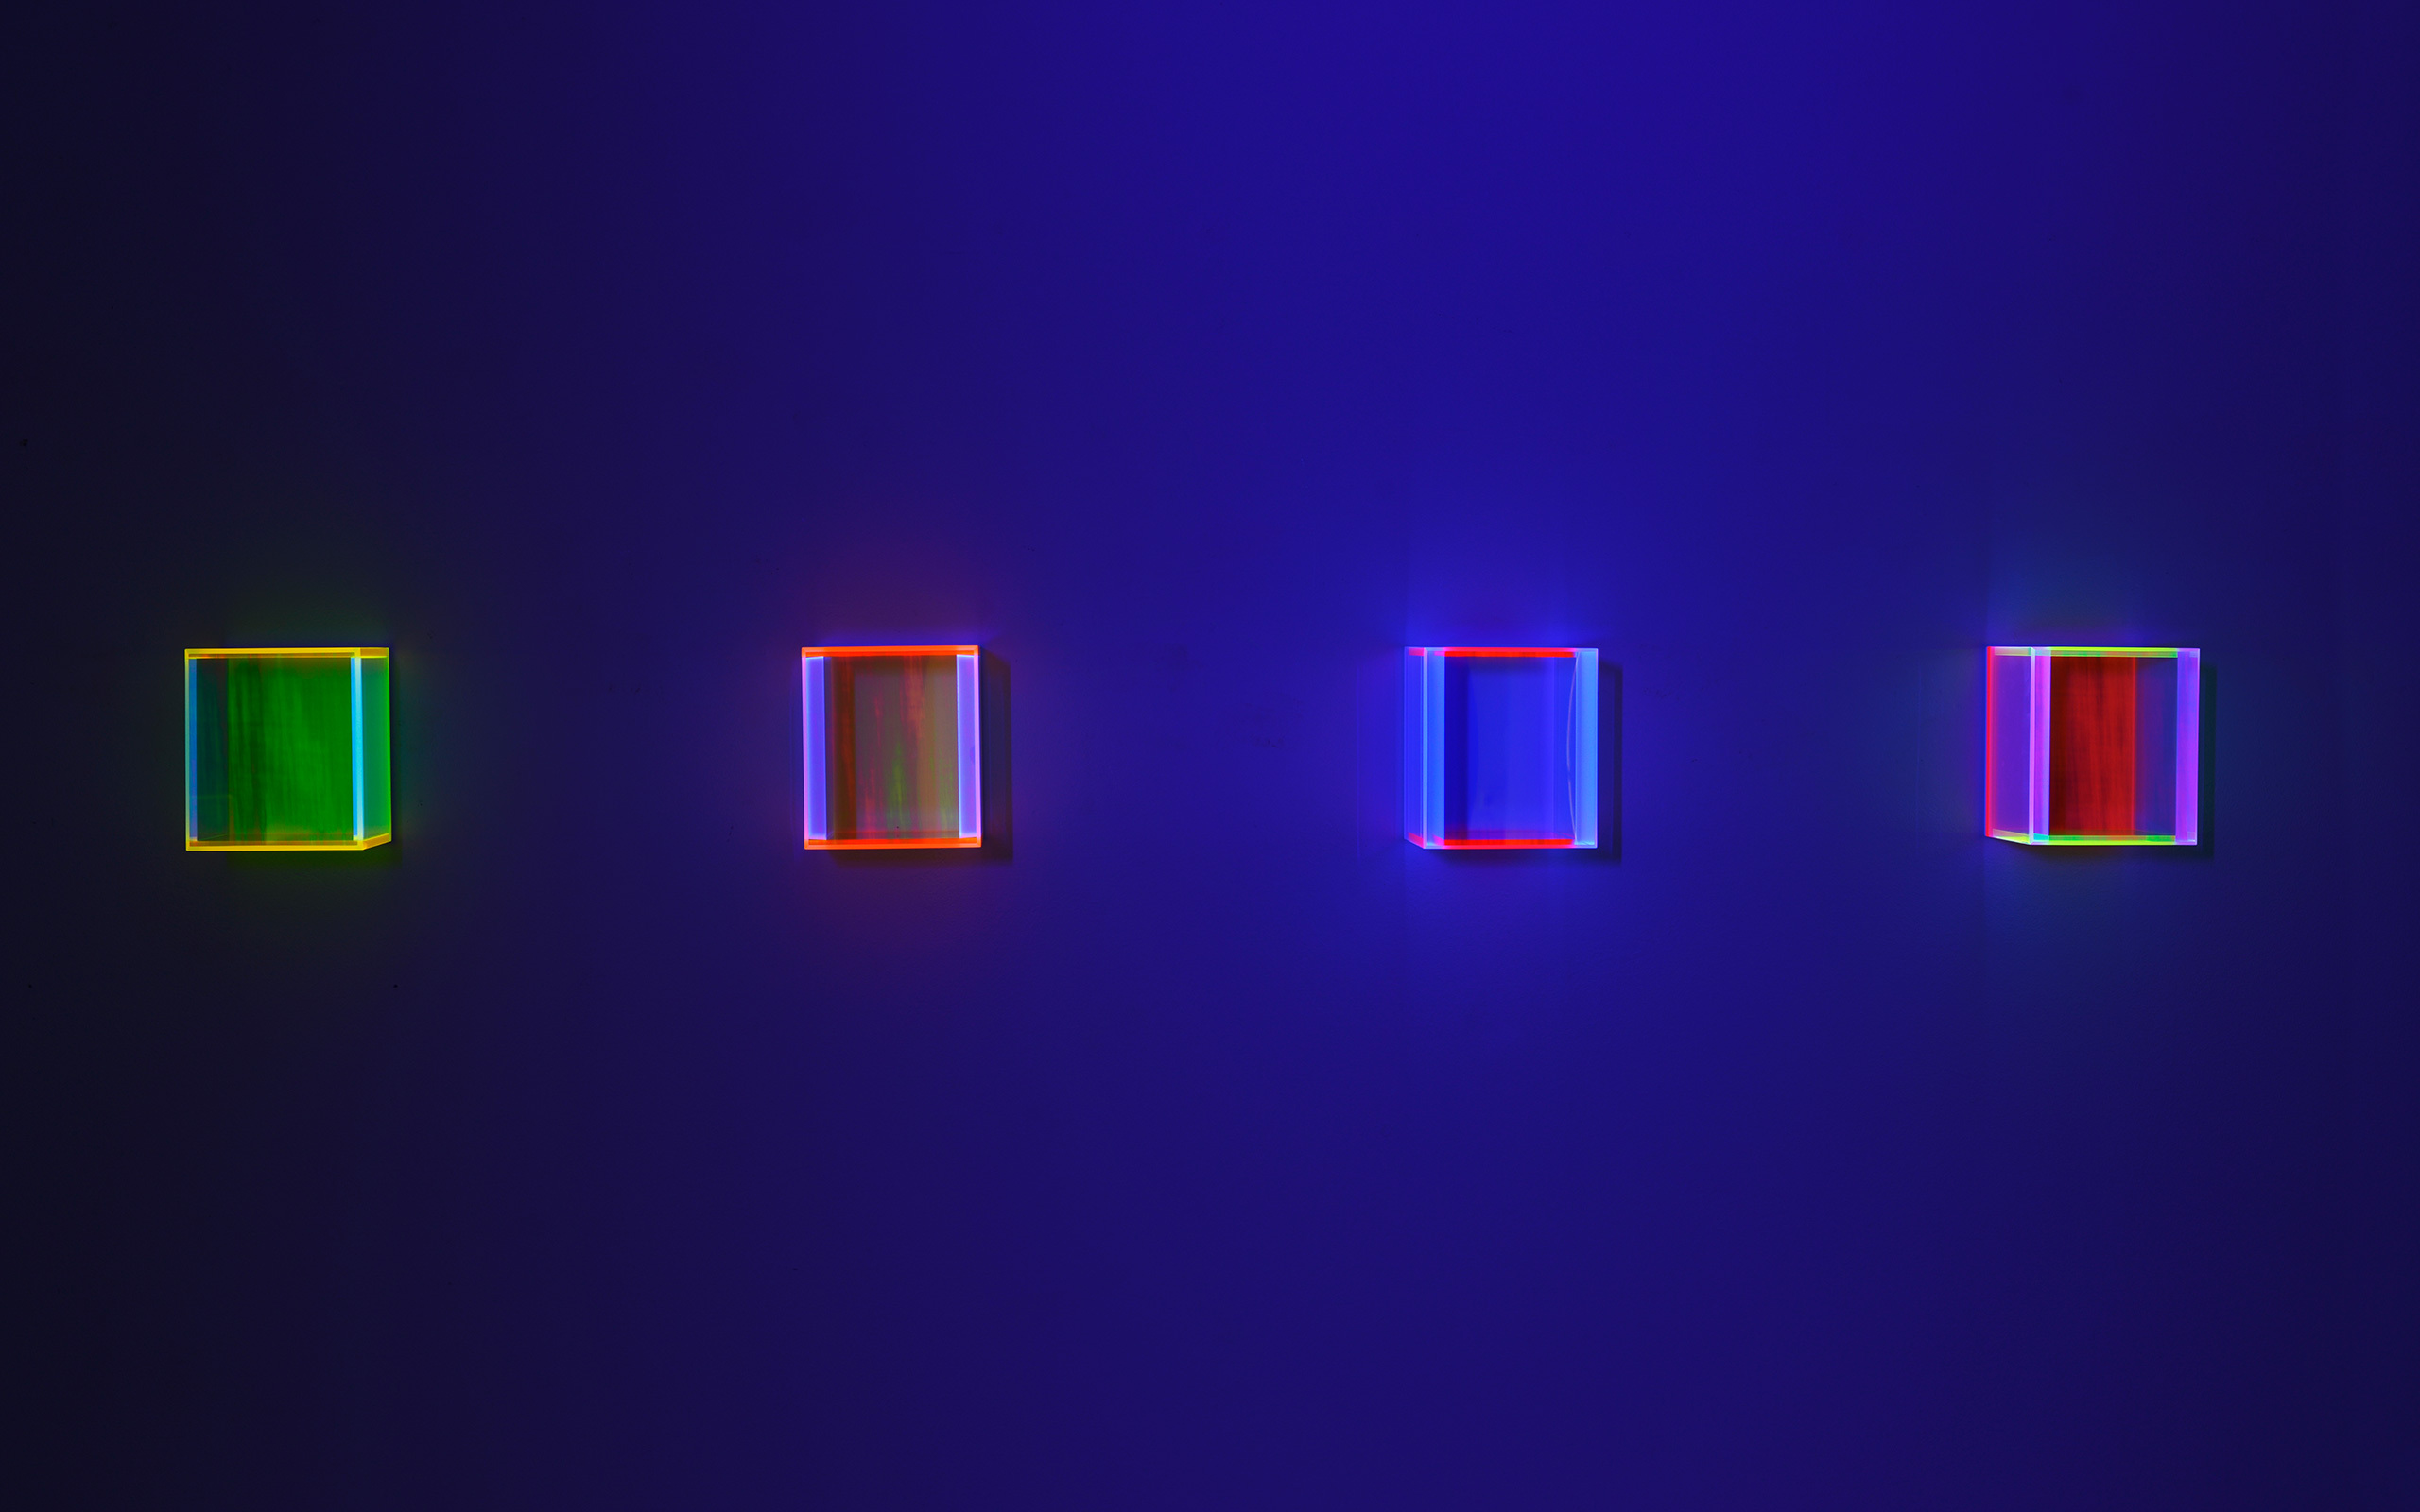 02 Regine Schumann Colormirror Rainbow Full Series 2020